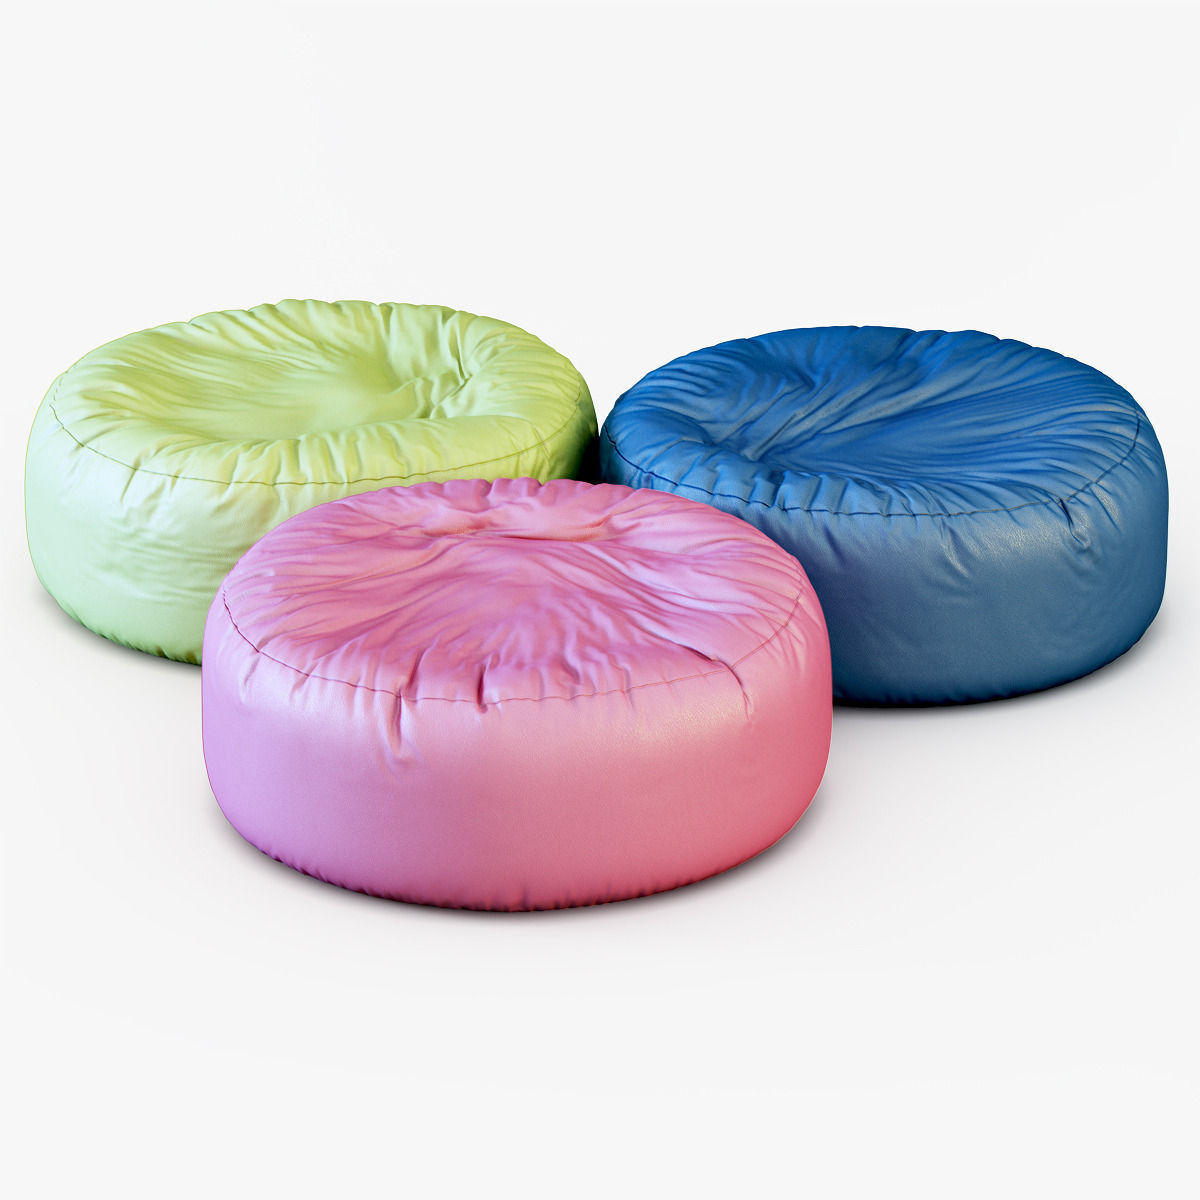 stunning pouf castorama klimex d model max with castorama pouf with pouf castorama. Black Bedroom Furniture Sets. Home Design Ideas